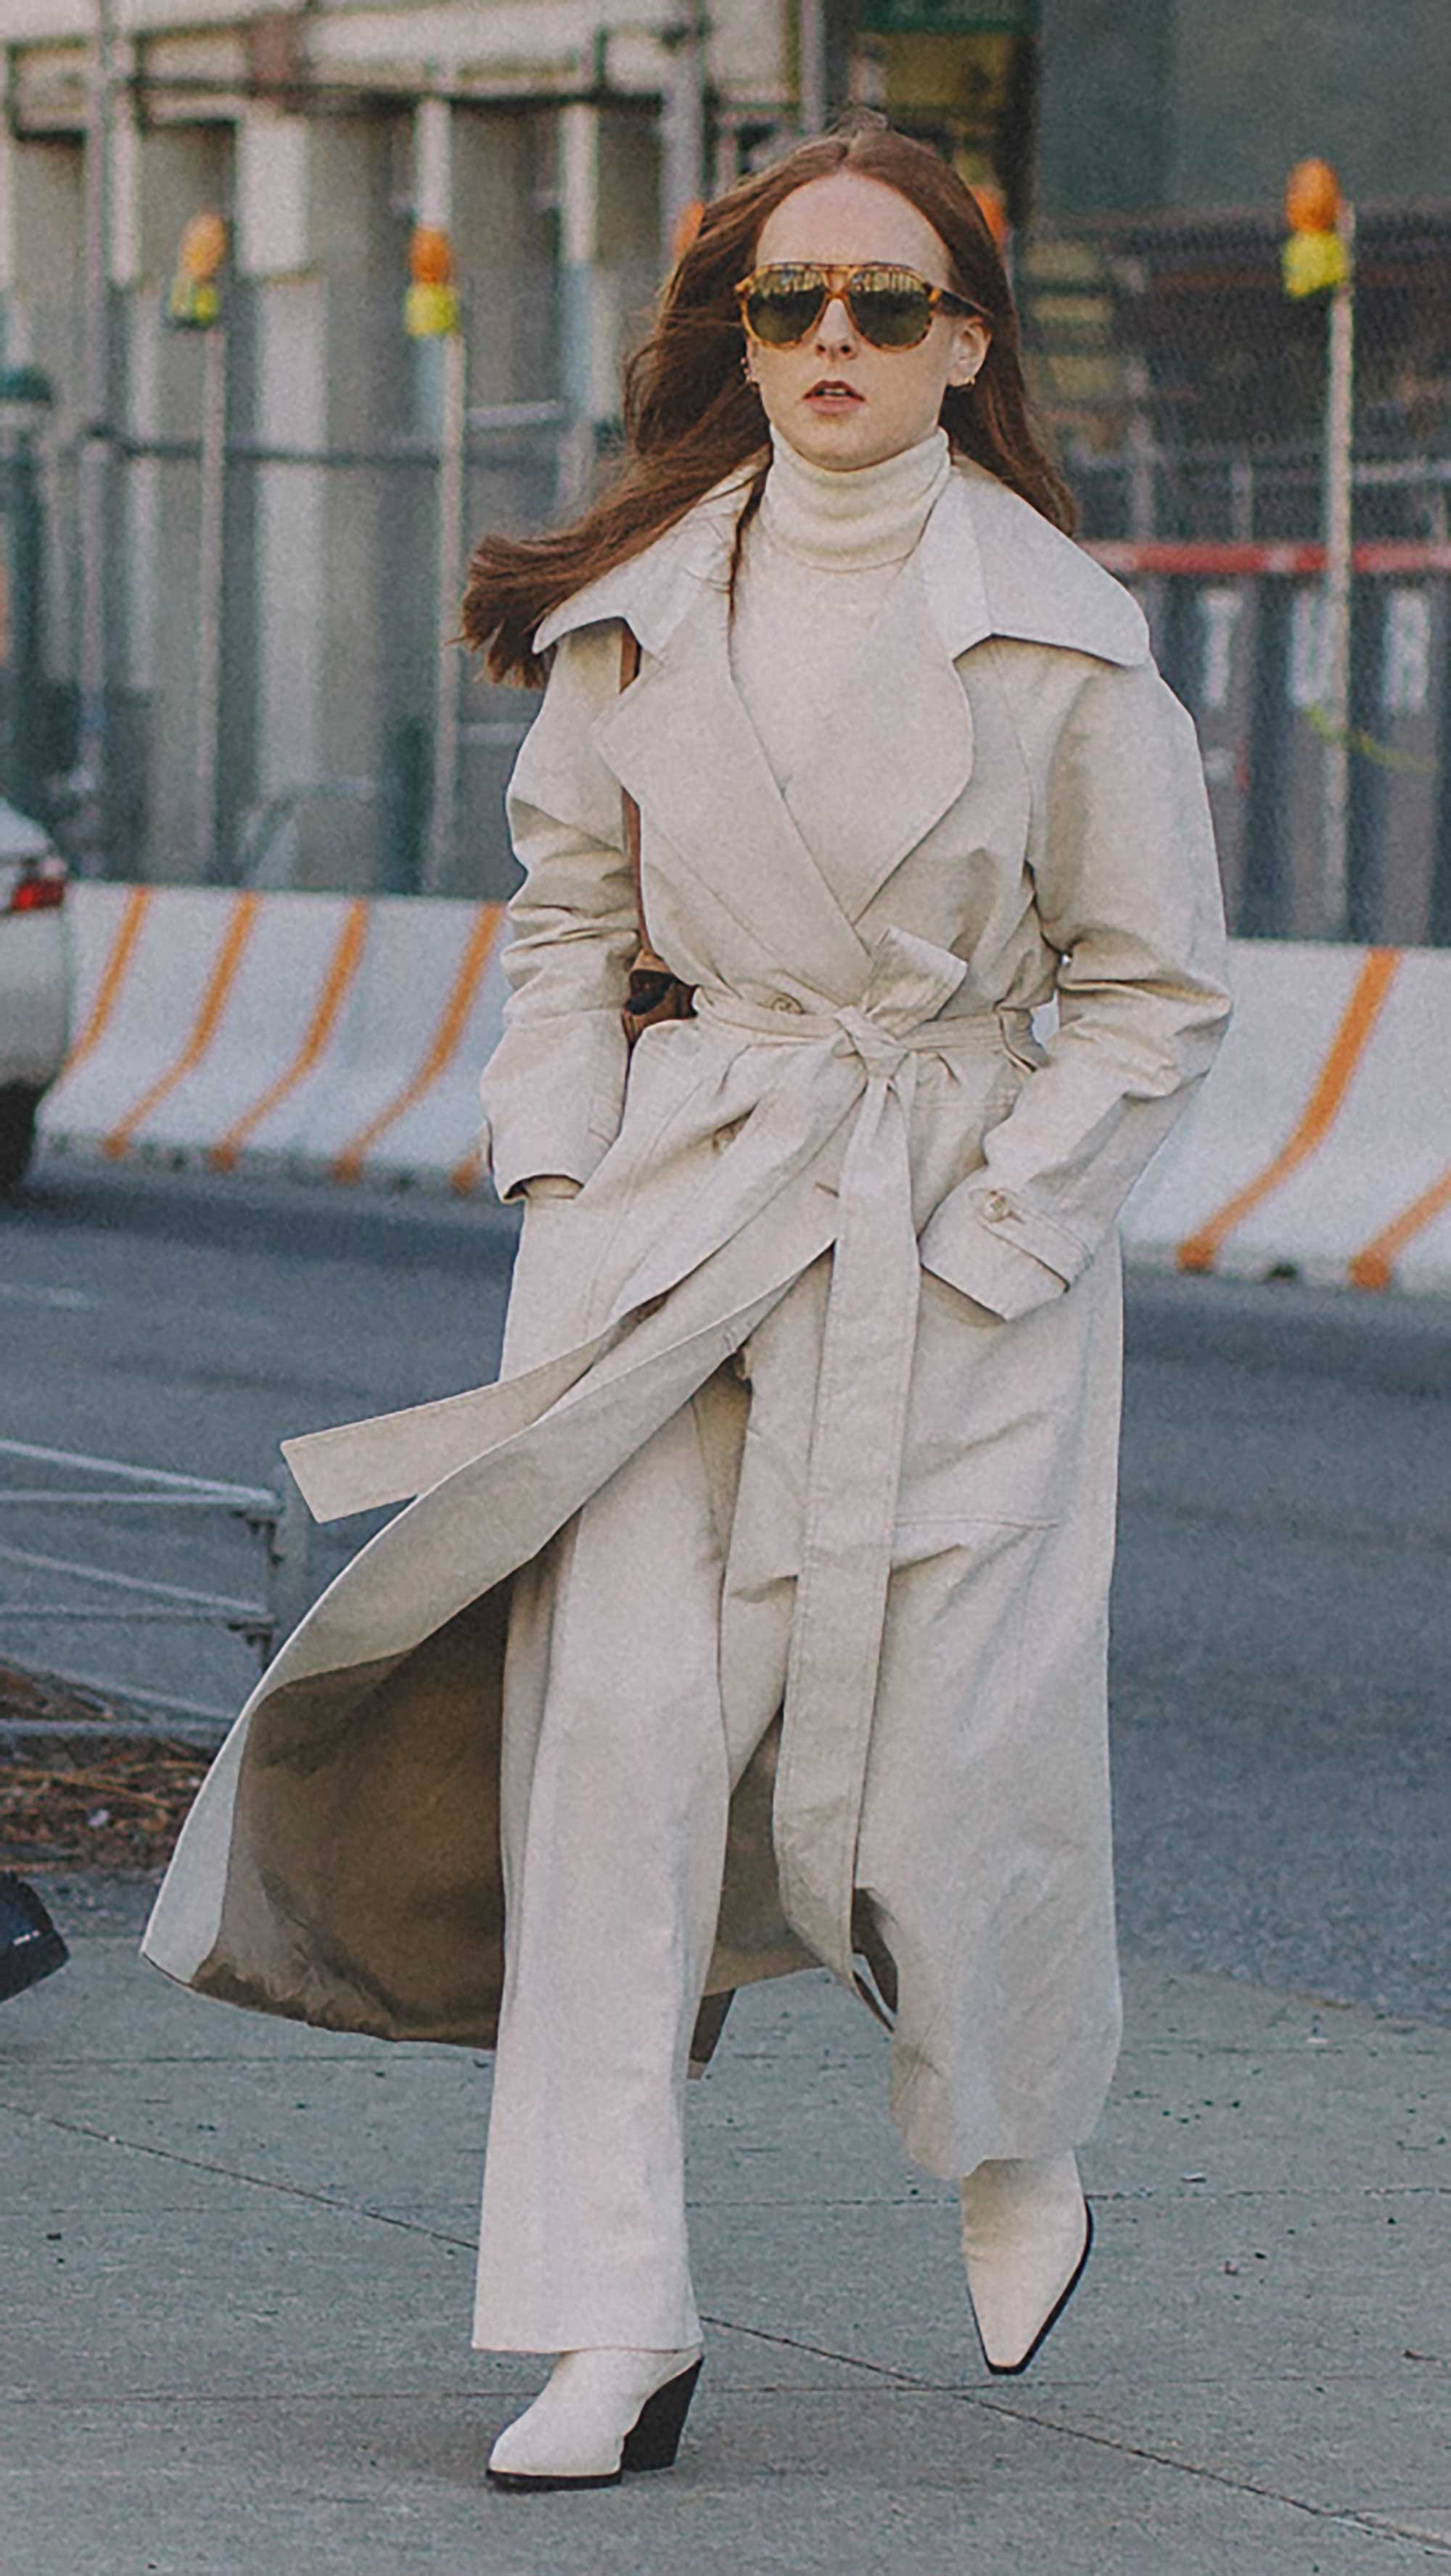 Best outfits of New York Fashion Week street style day three NYFW FW19 - 43.jpg